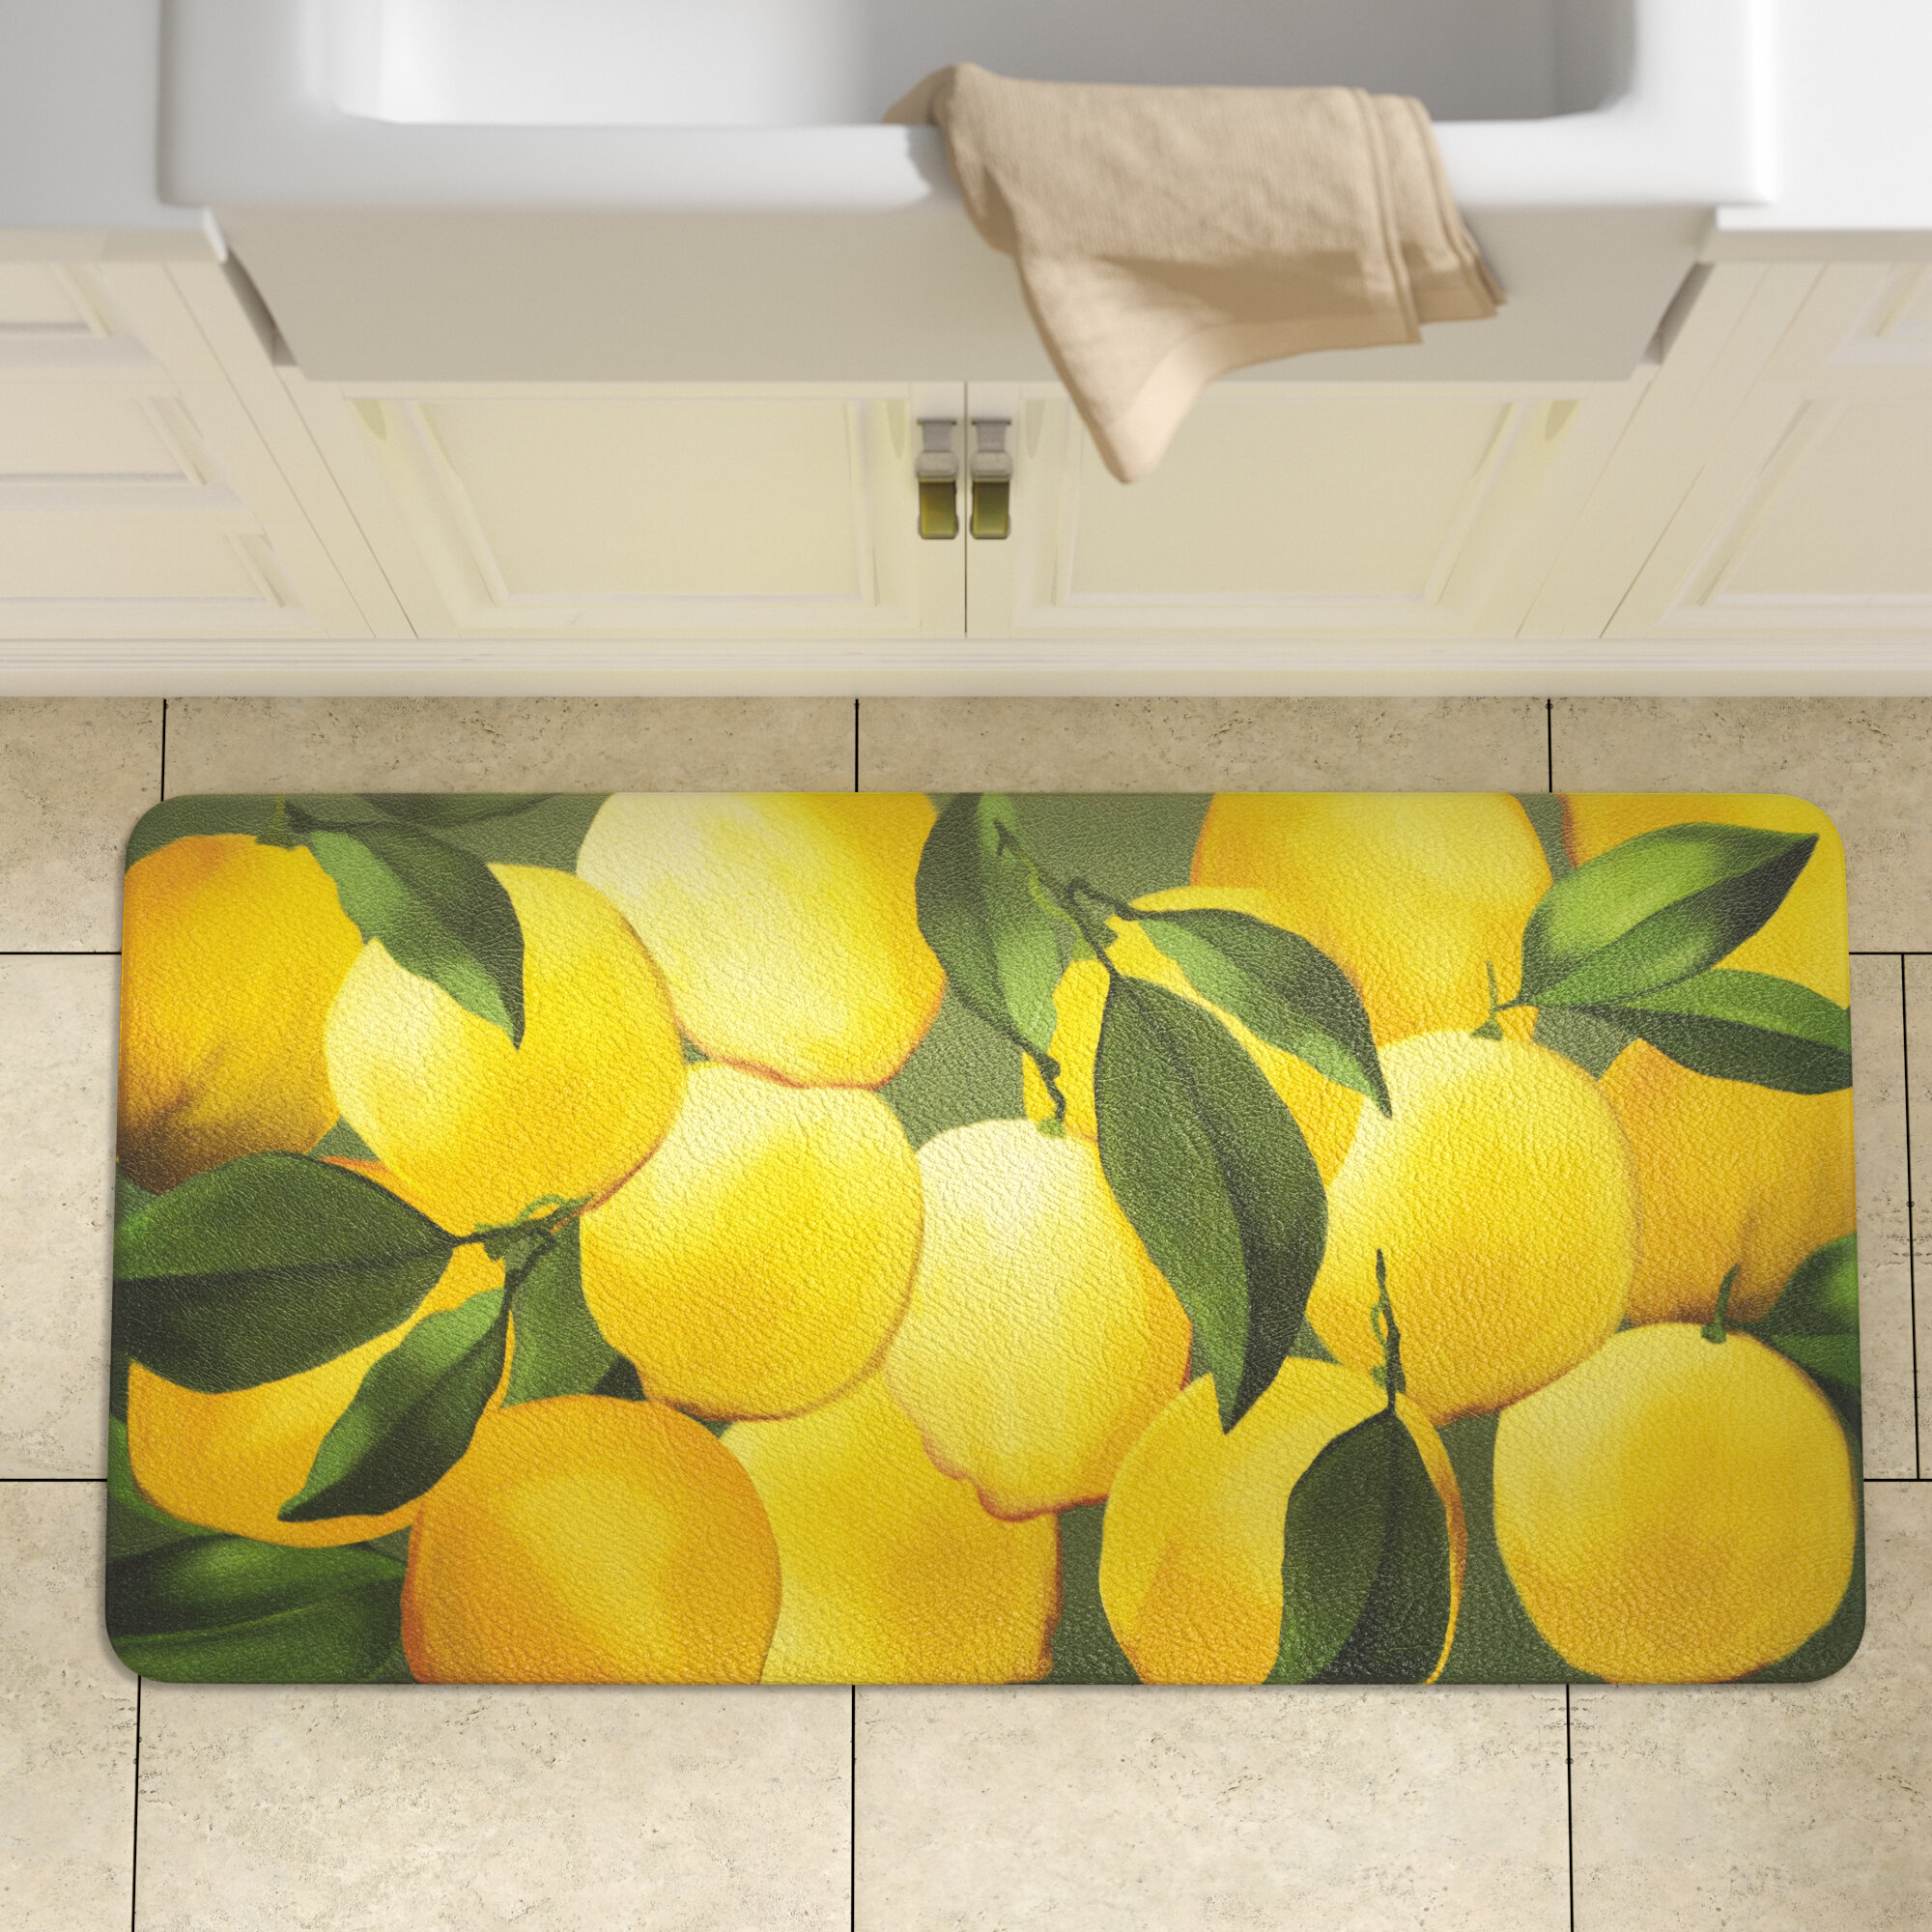 Lemon Yellow Rug Kitchen Mats You Ll Love In 2021 Wayfair